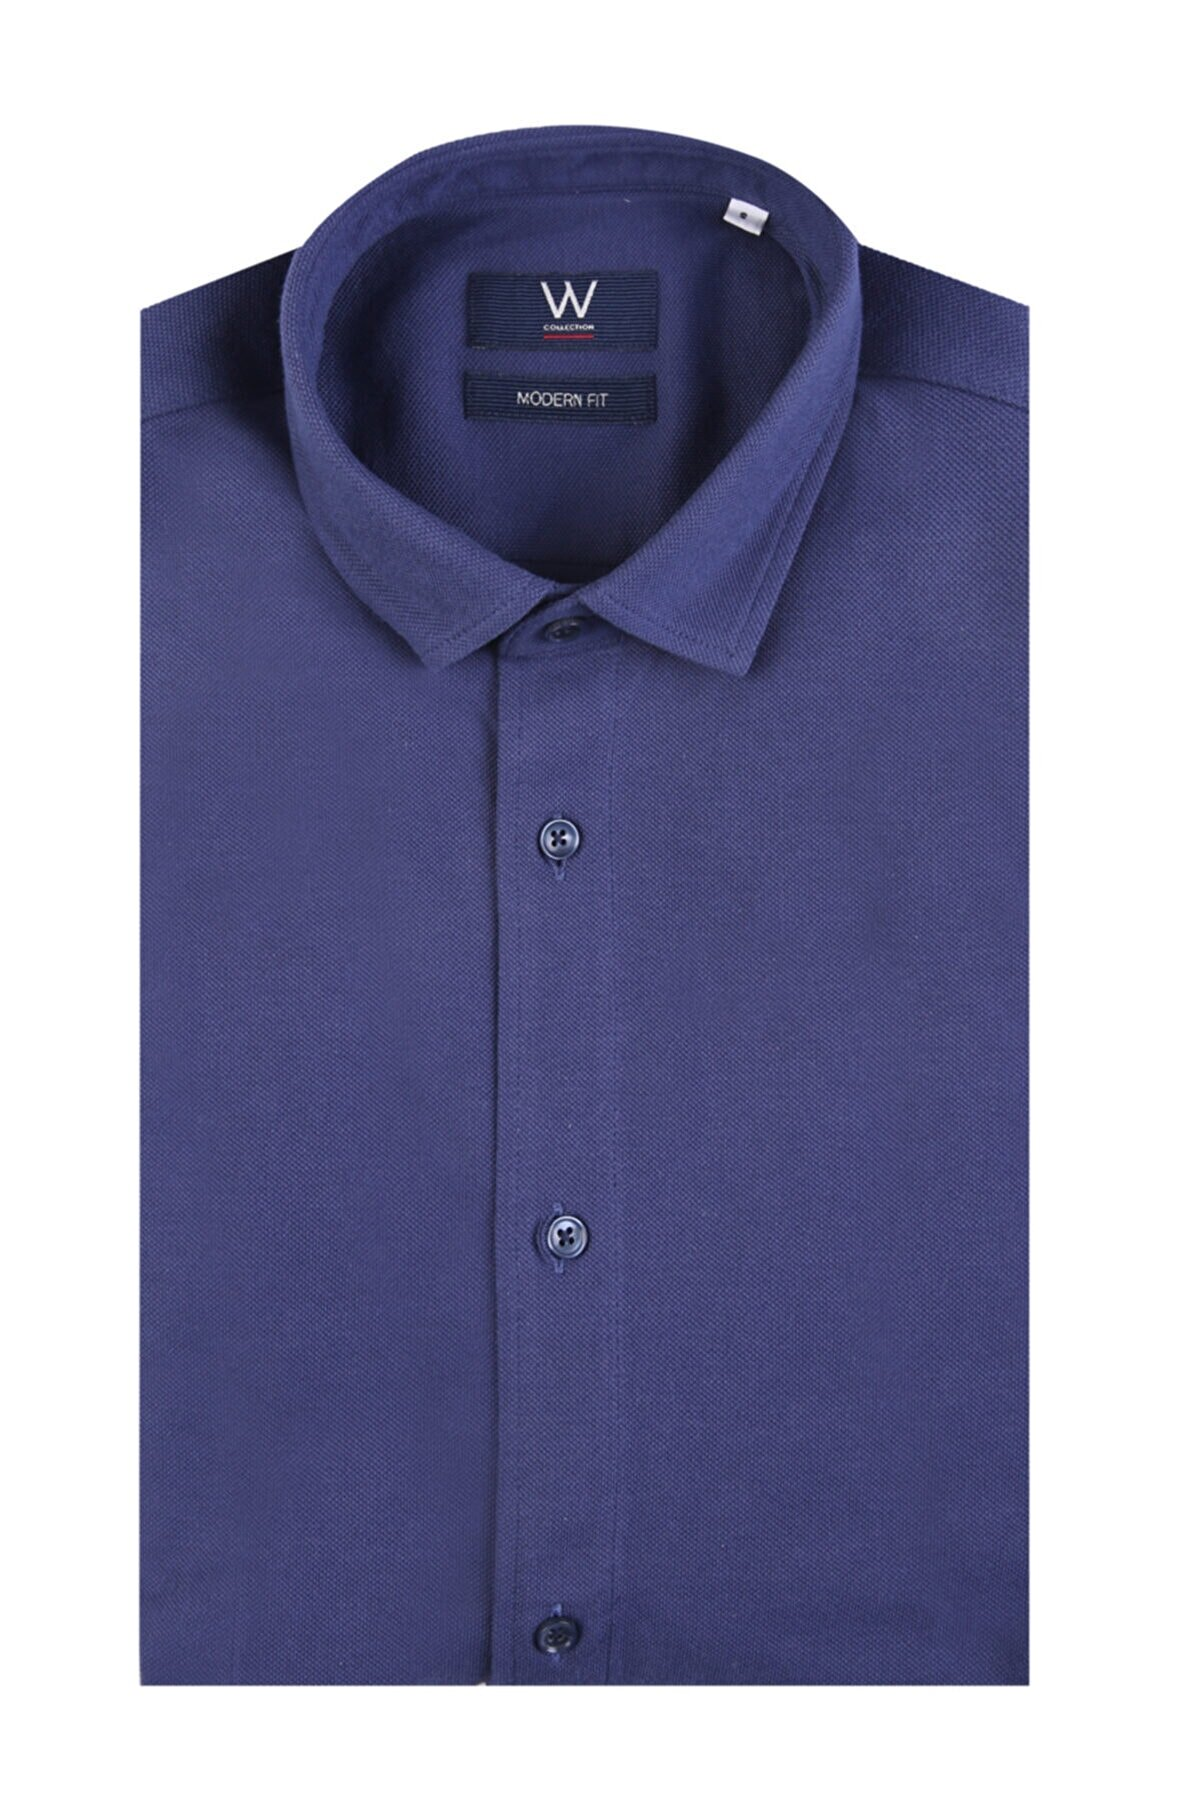 W Collection Lacivert Gömlek